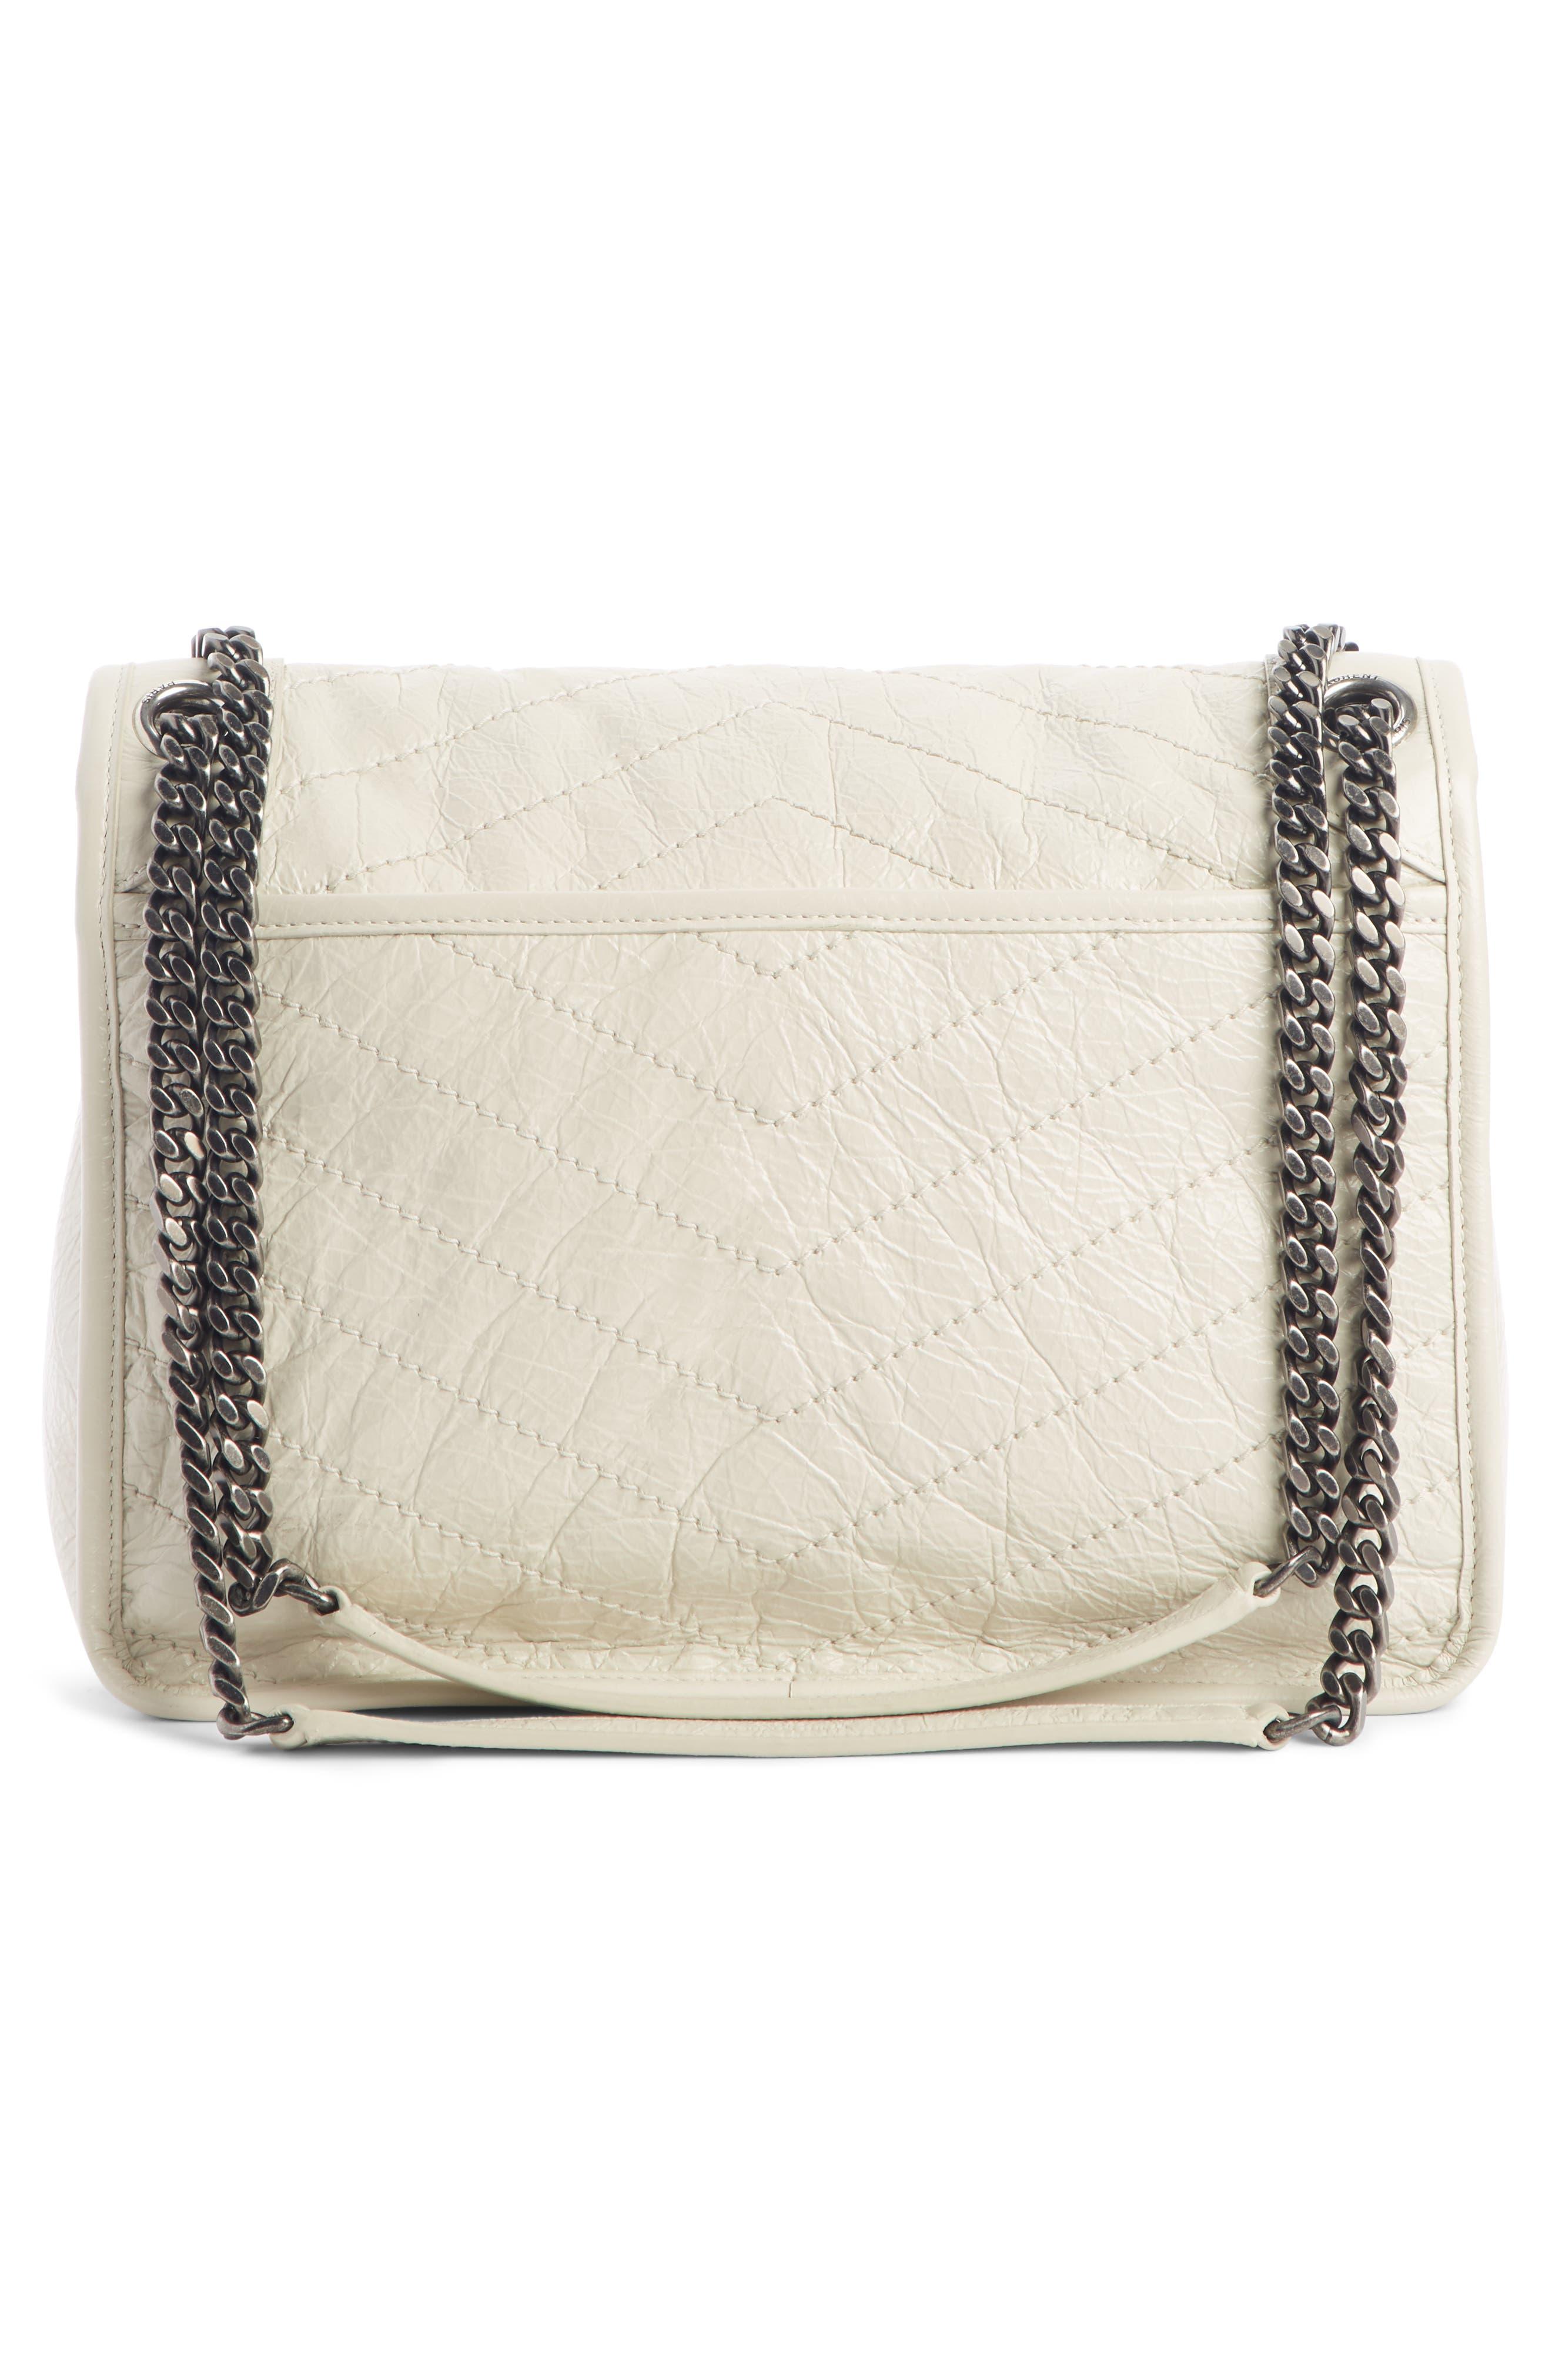 SAINT LAURENT, Medium Niki Leather Shoulder Bag, Alternate thumbnail 3, color, CREMA SOFT